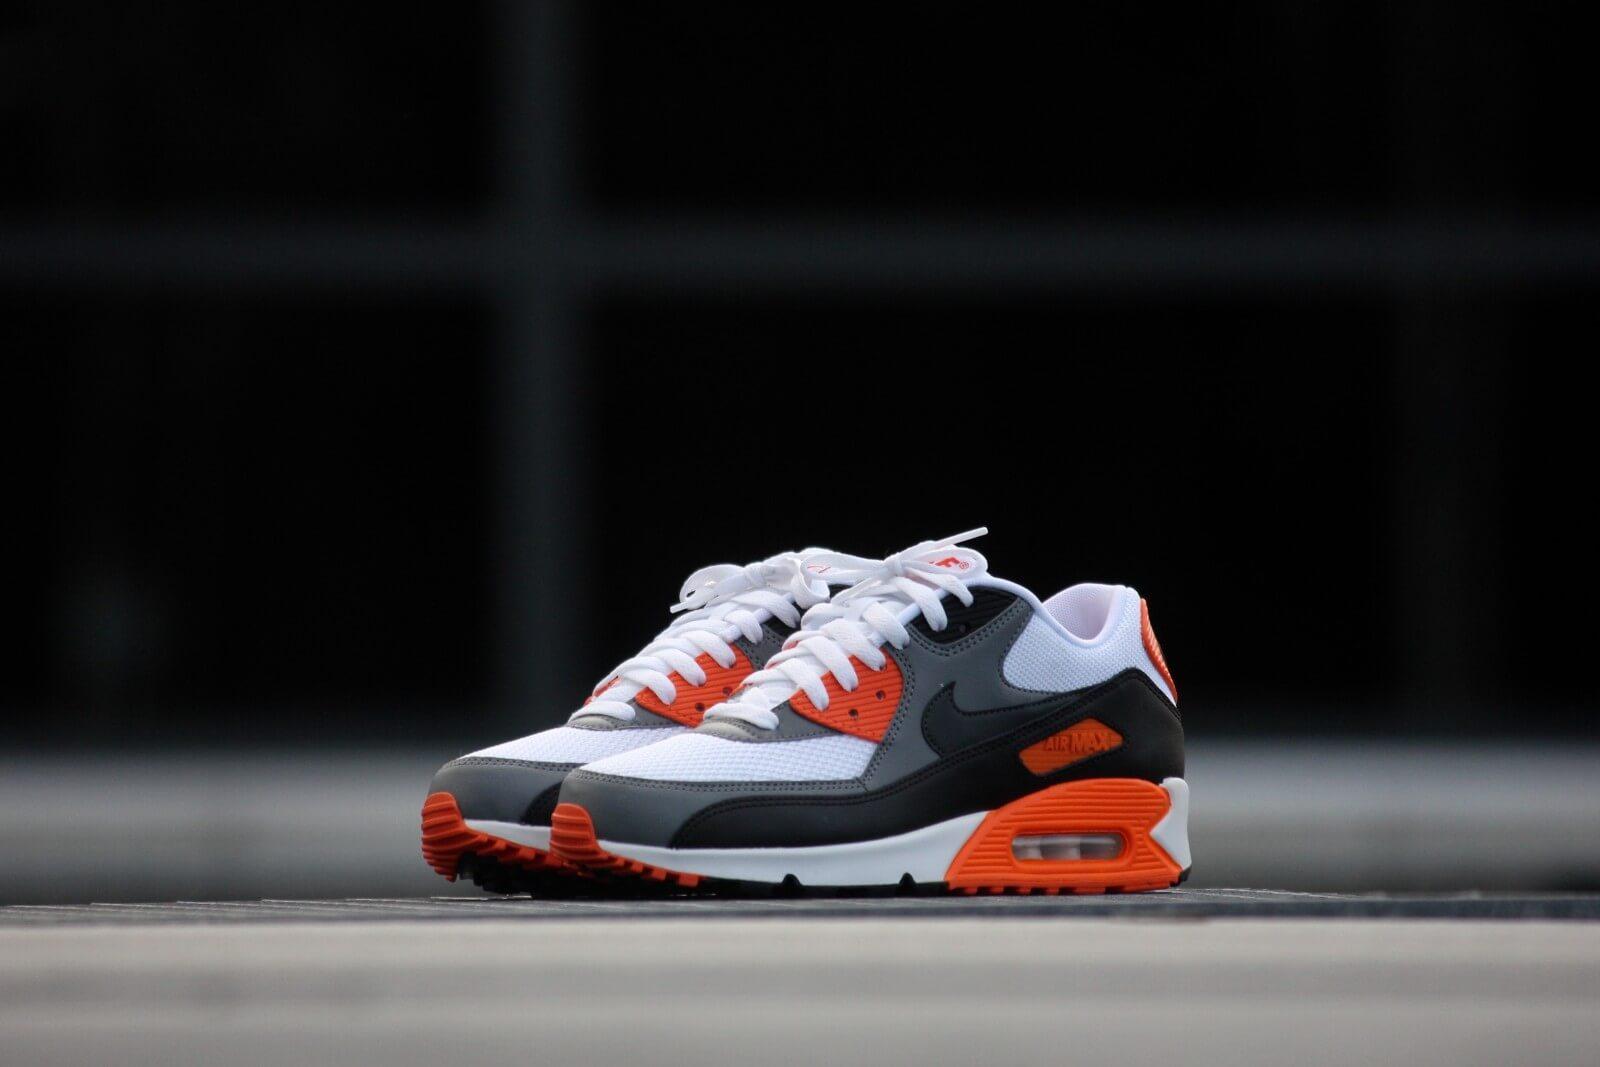 Nike Air Max 90 Essential White Anthracite Cool Grey Orange 537384 128